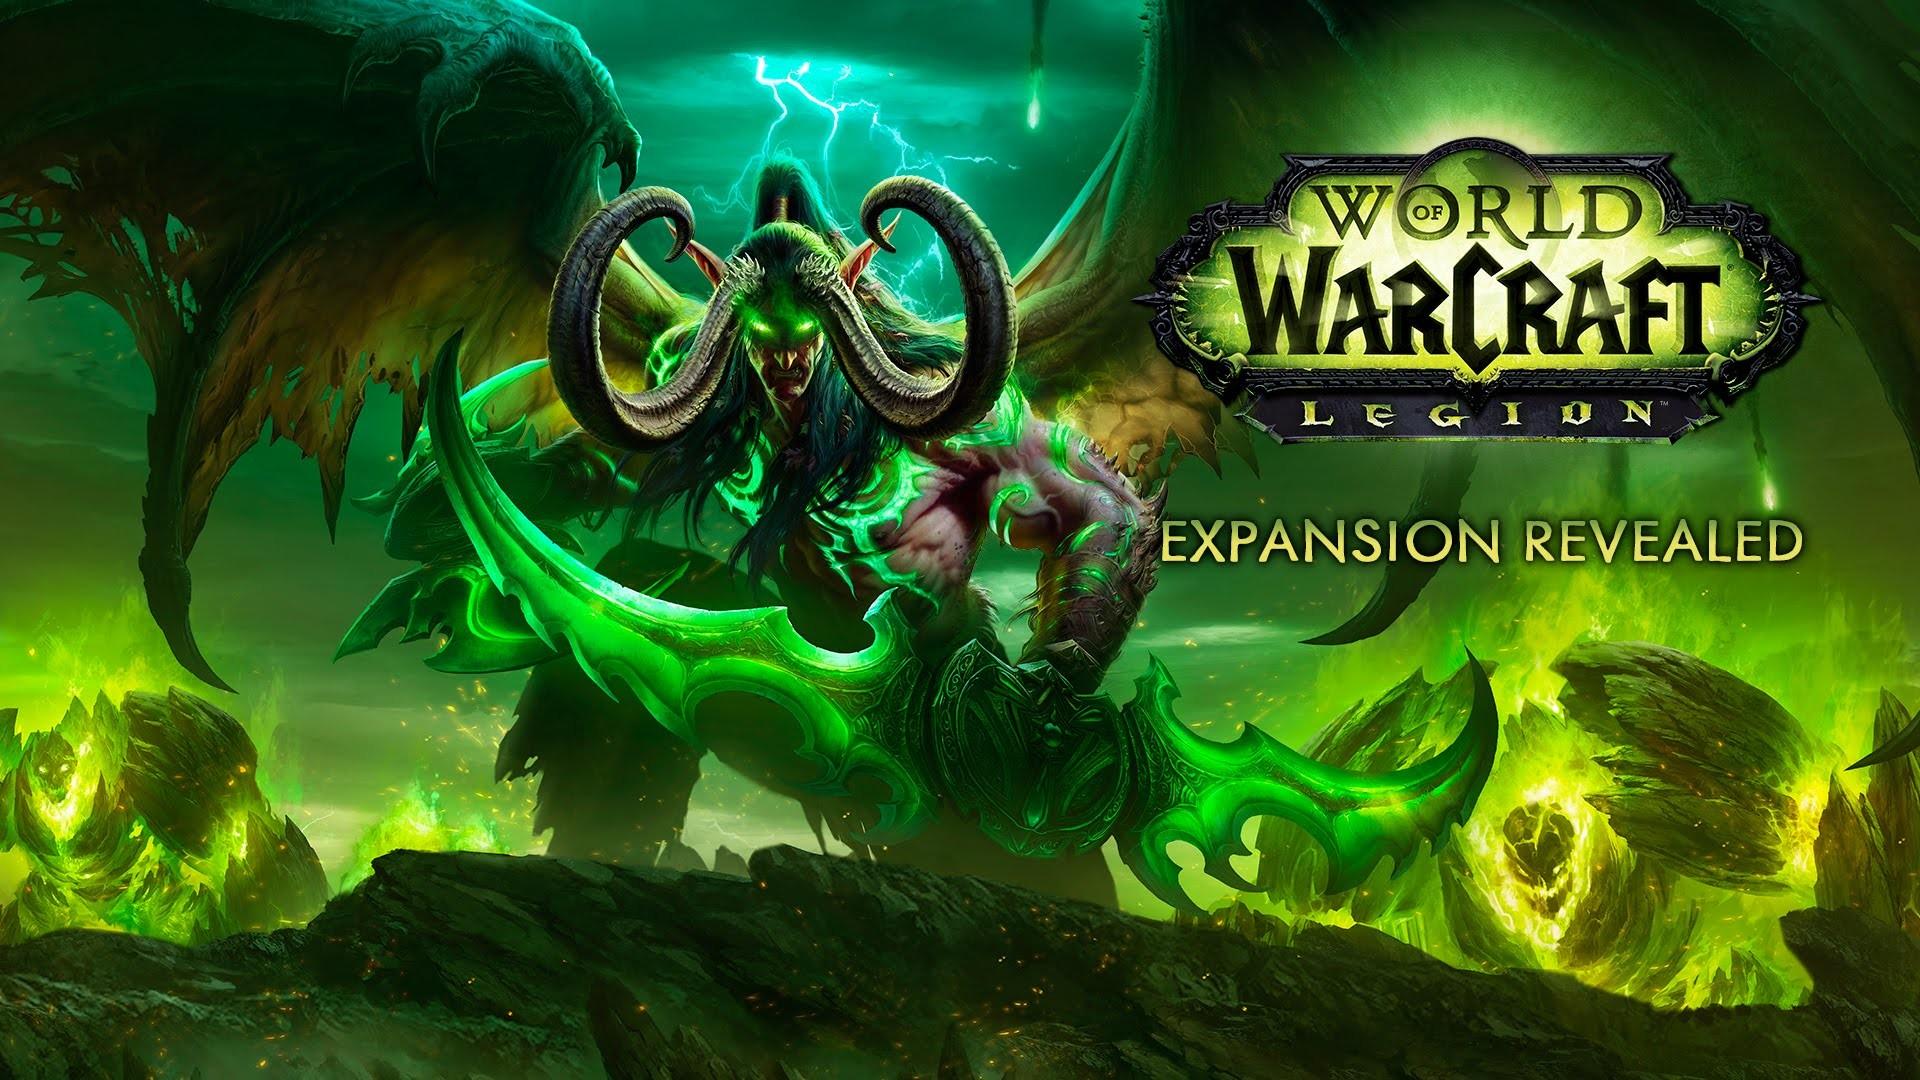 Desktop Wallpaper – None that fit 1920:1080? – World of Warcraft Forums